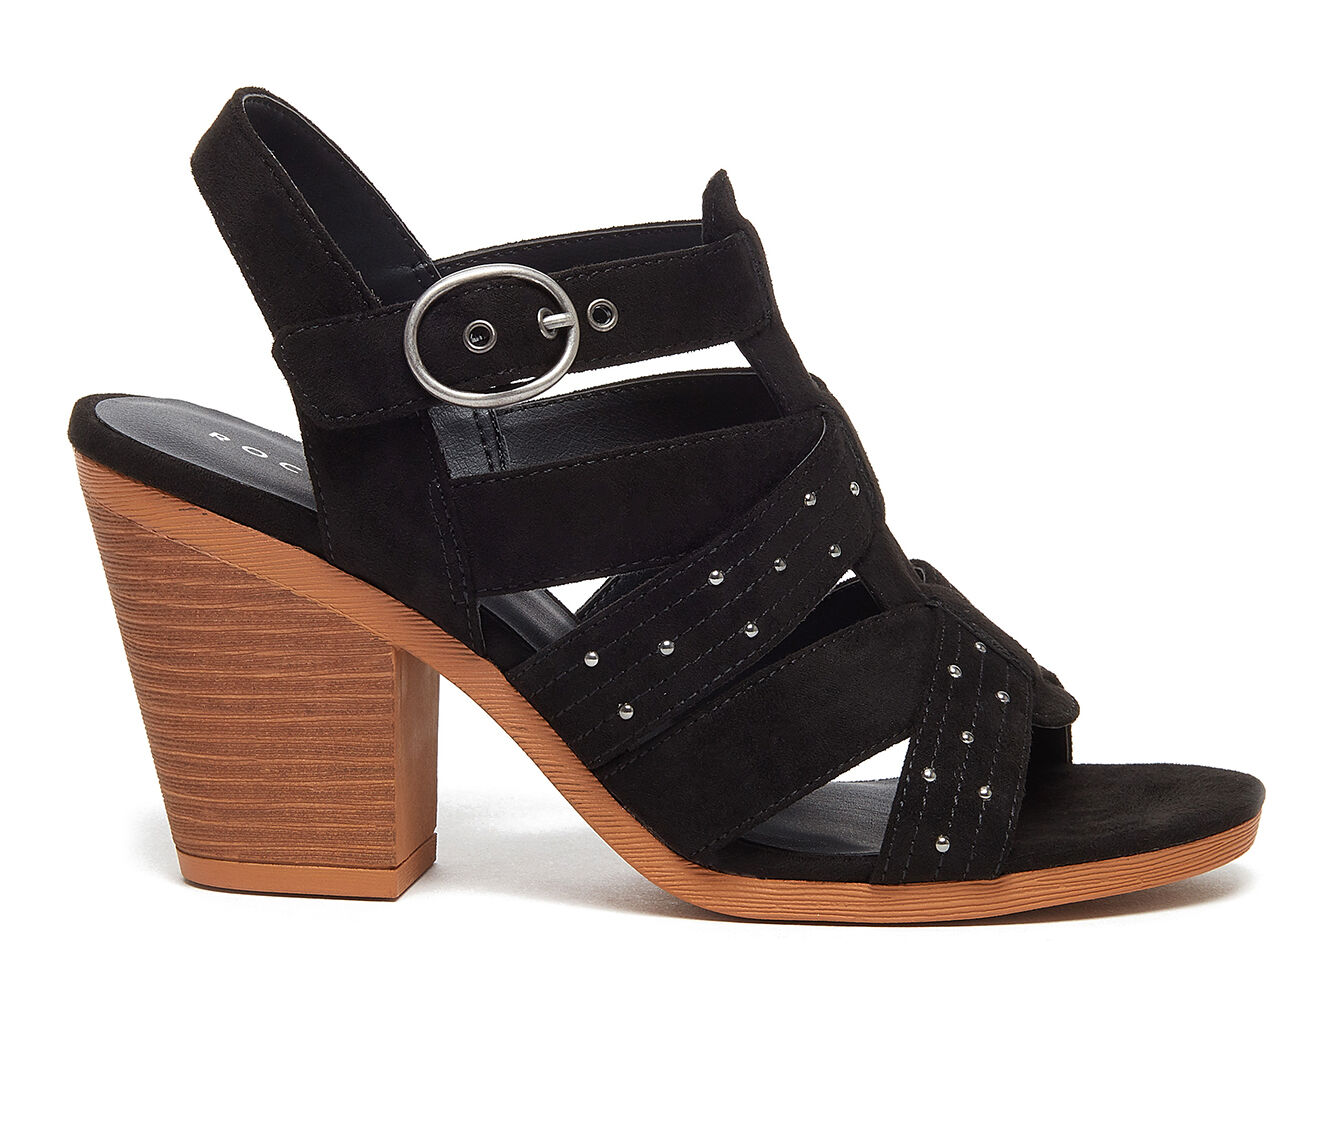 Women's Rocket Dog Yeehaw Strappy Heeled Sandals Black